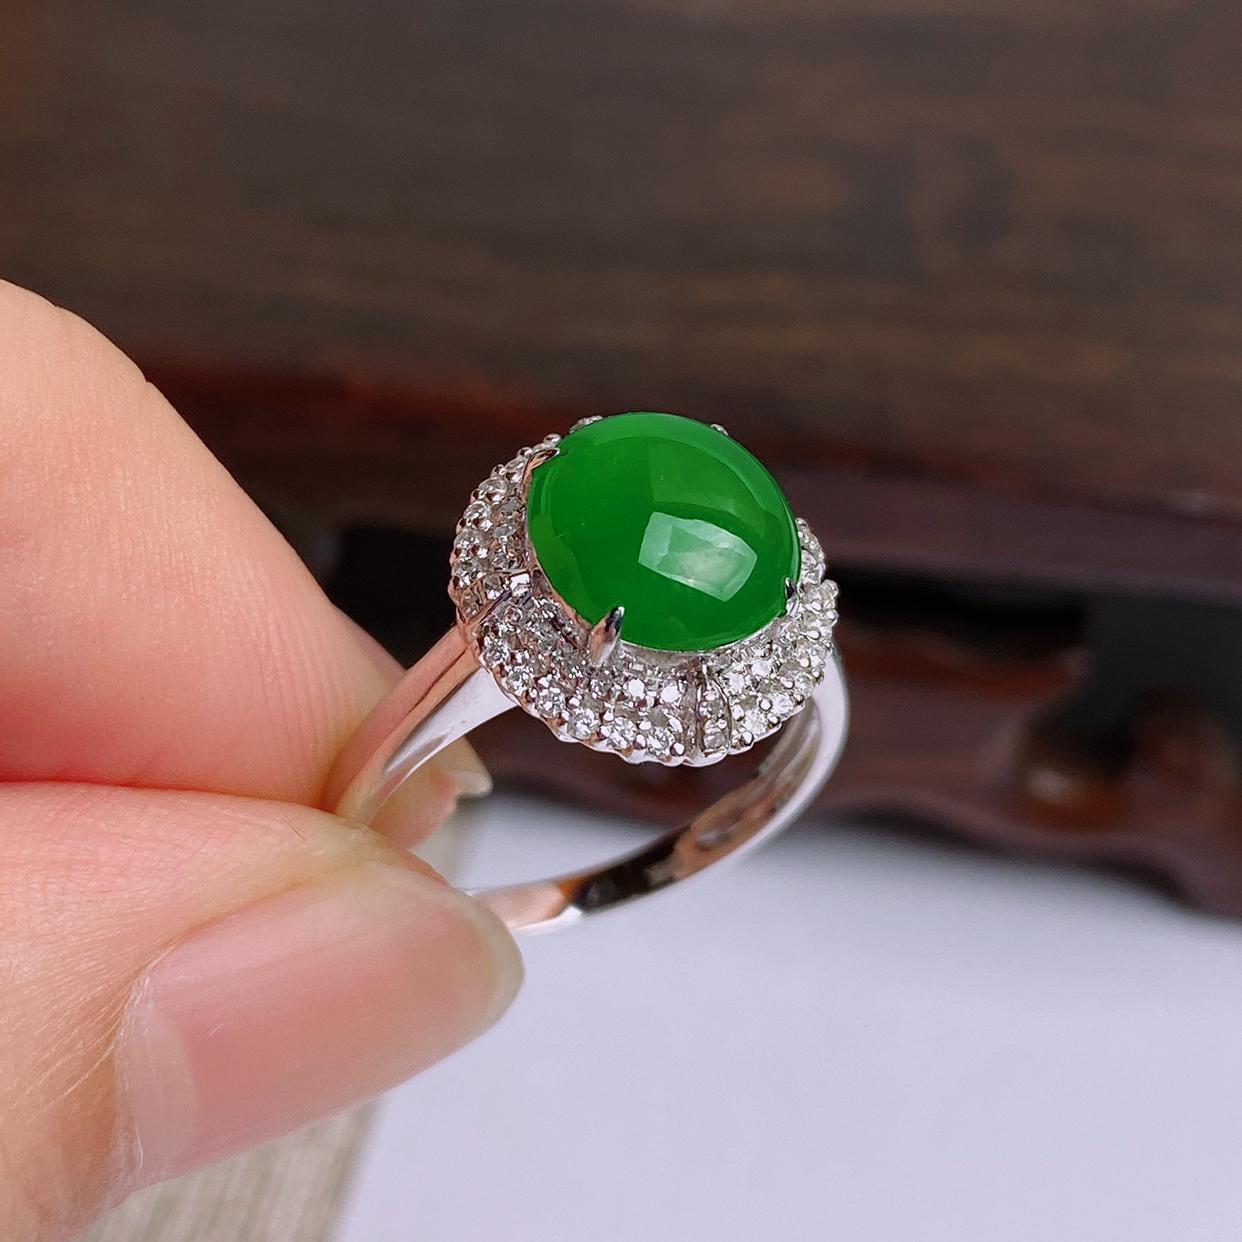 A货翡翠-种好满绿18K金伴钻蛋面戒指,尺寸-裸石9*8.3*3.2mm整体13*12.5*7.7m